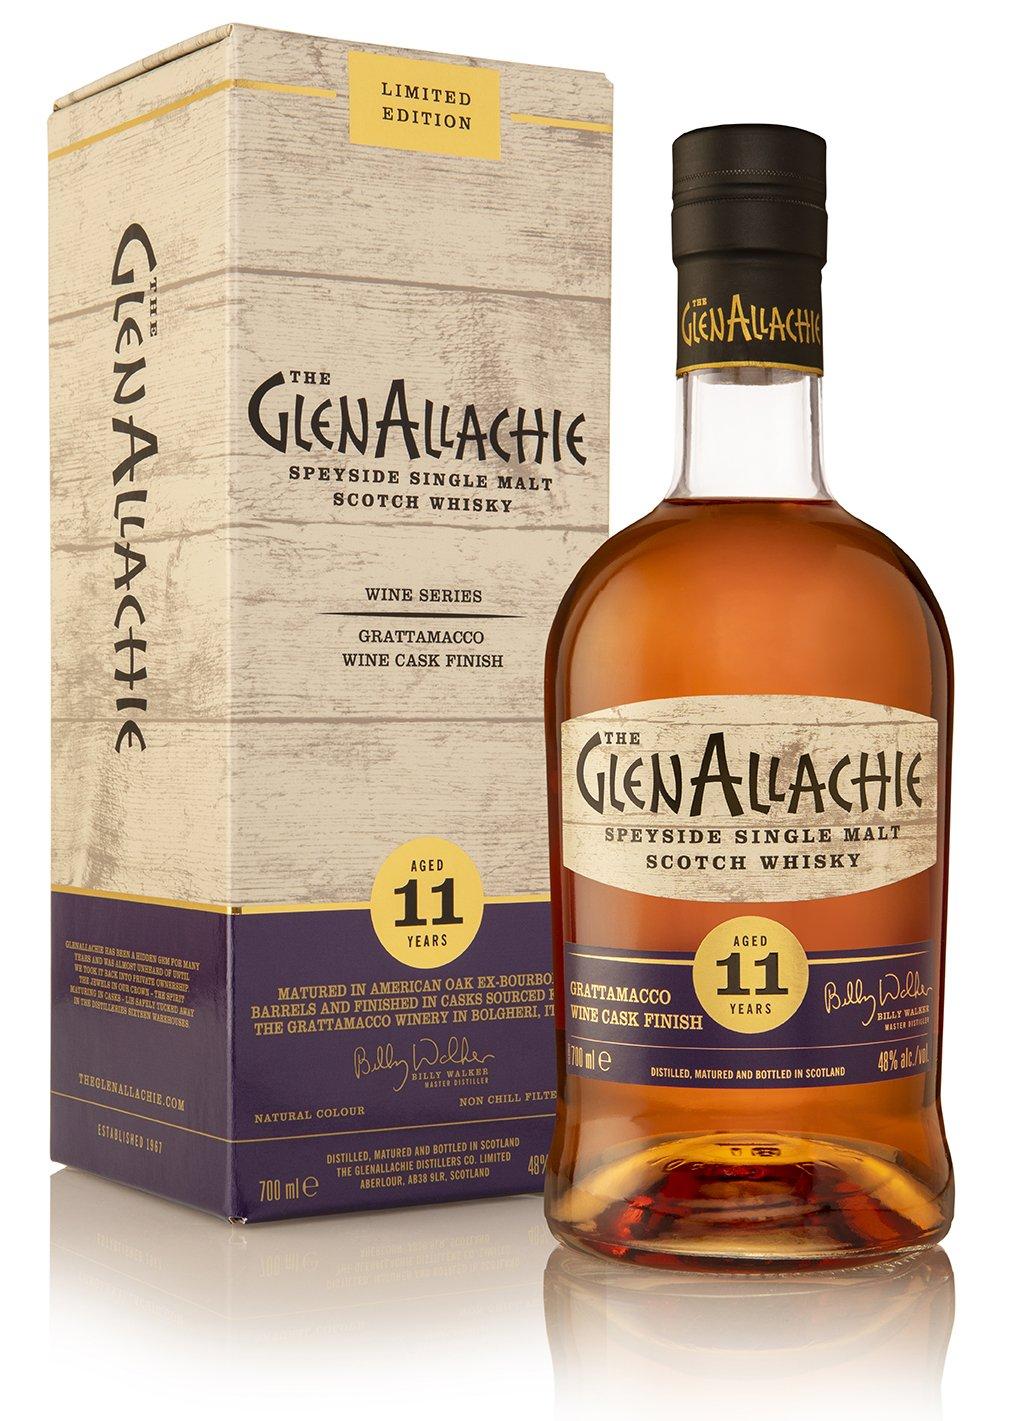 GlenAllachie 11yo Grattamacco